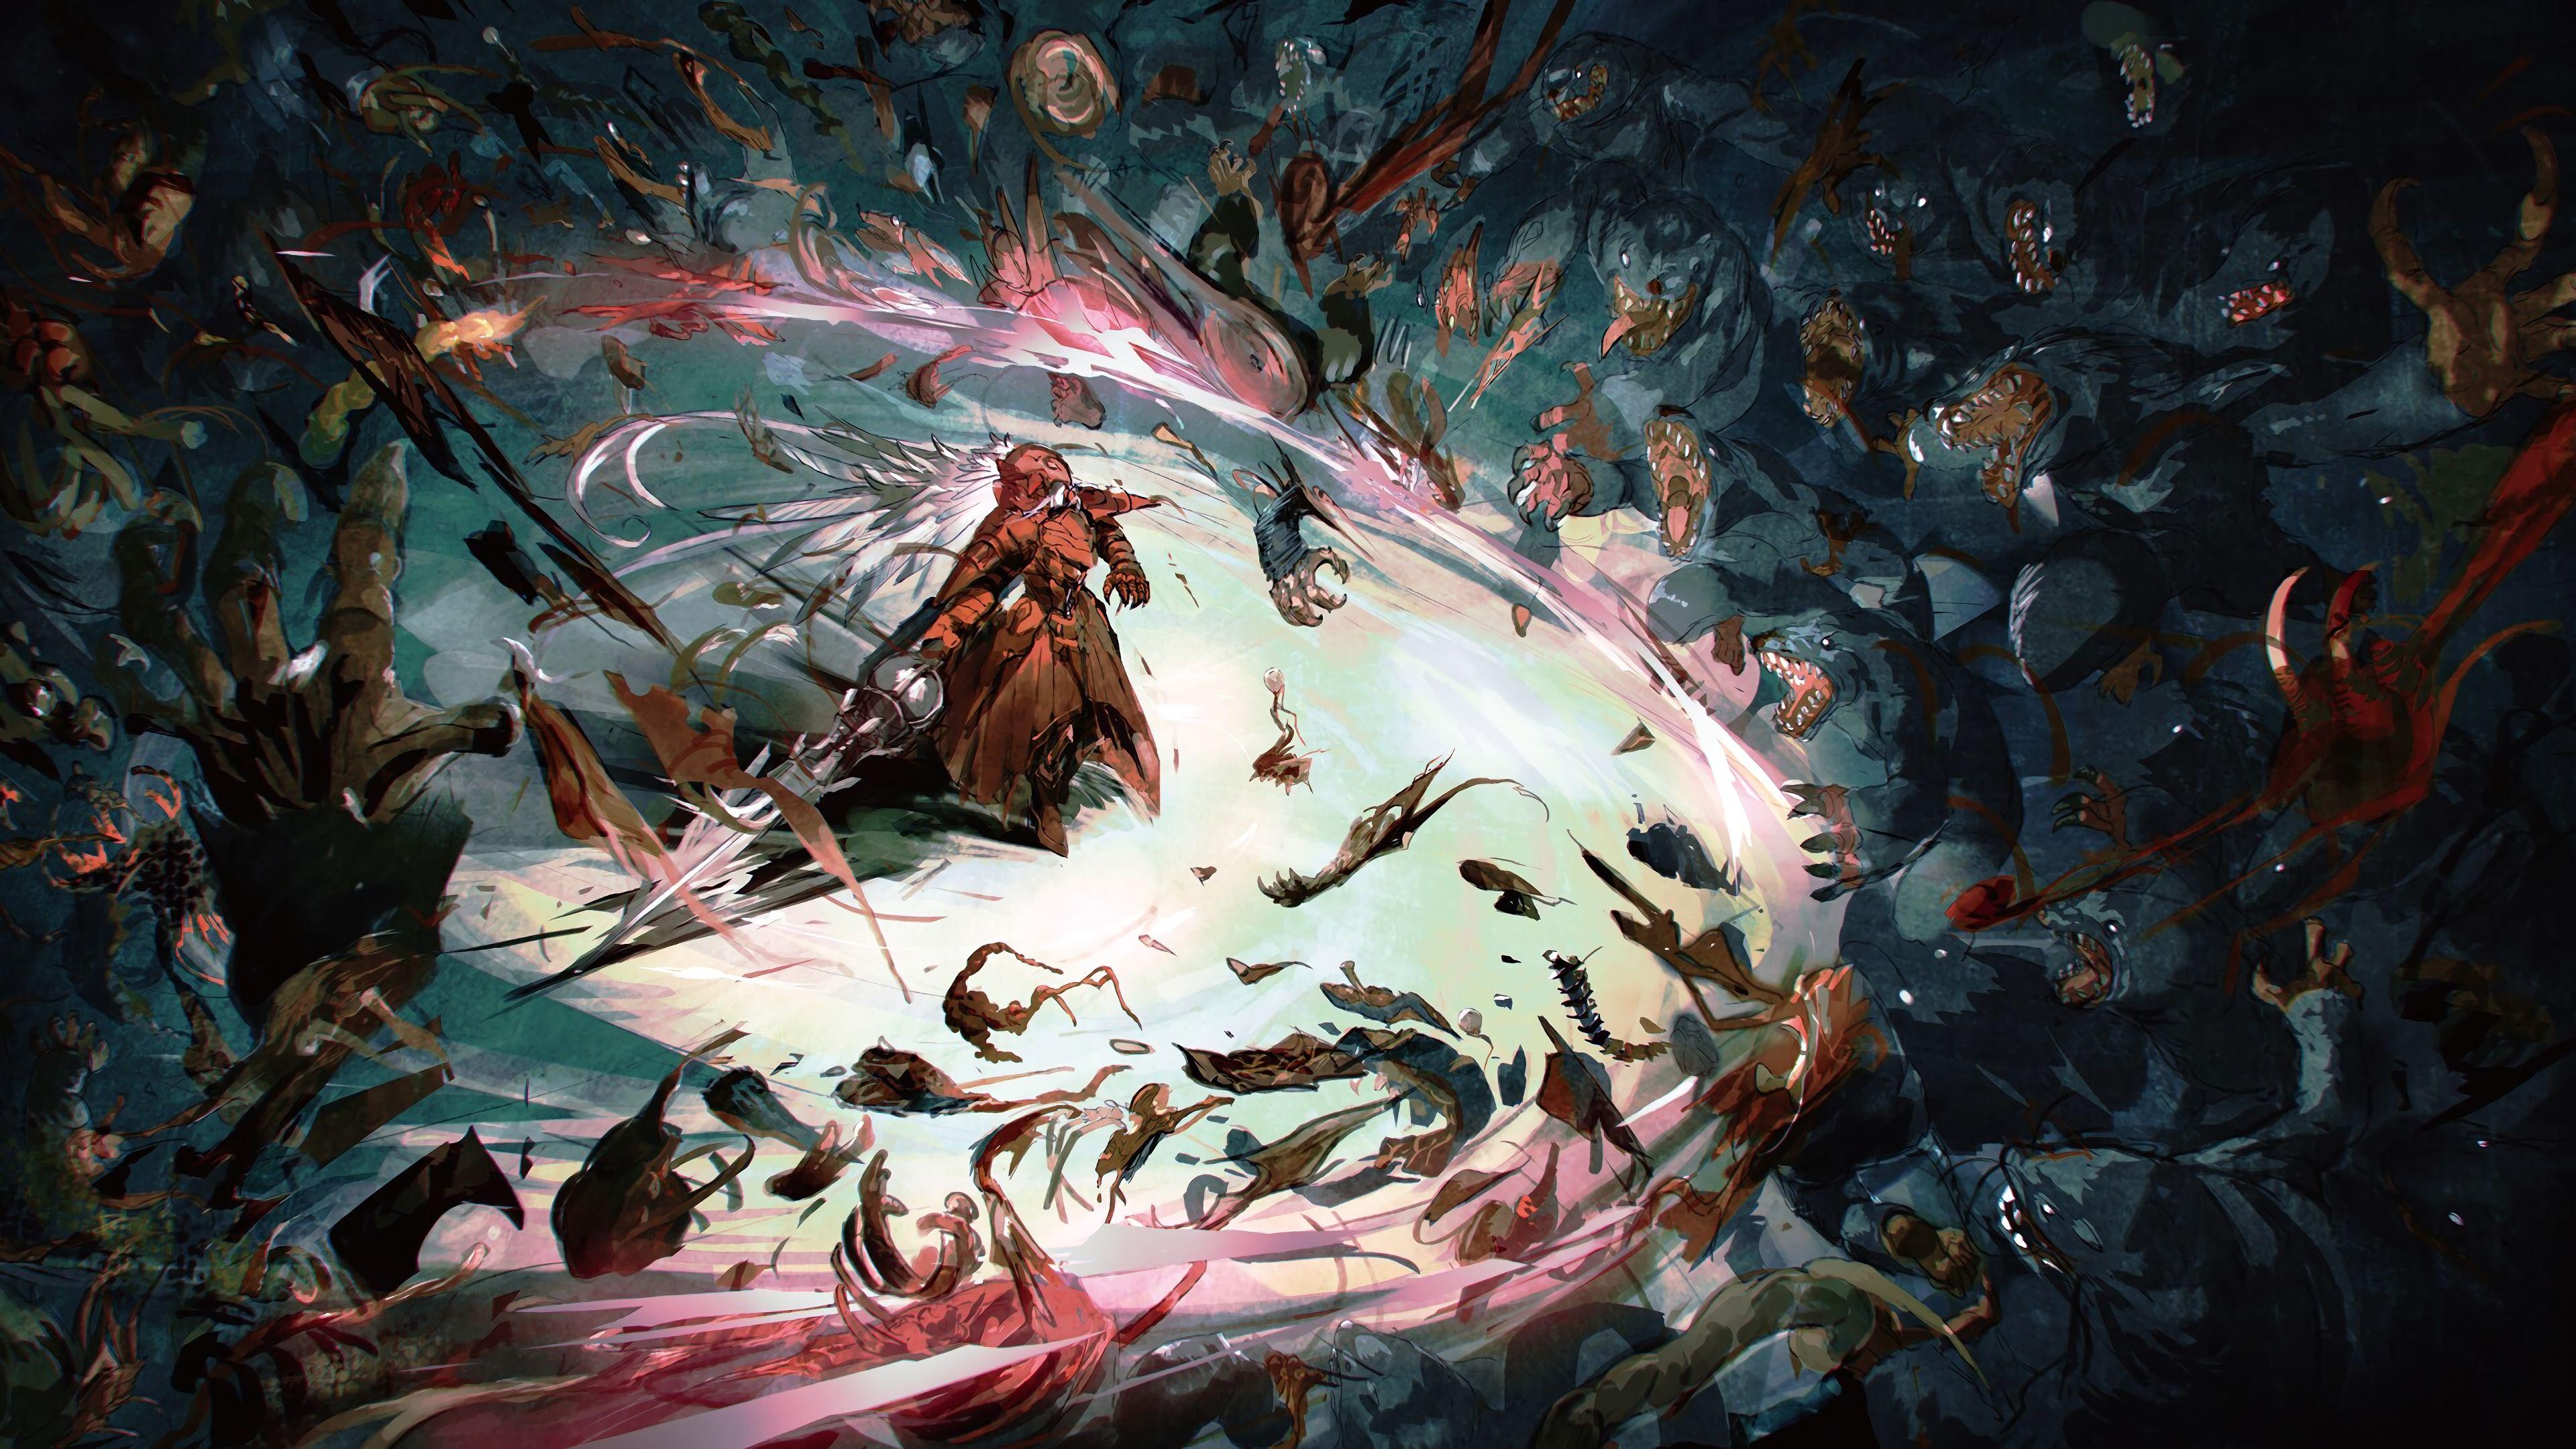 Overlord Anime Shalltear Bloodfallen Knight Fighting 3840x2160 Wallpaper Shalltear Bloodfallen Overlord Anime Overlord Anime Wallpapers 10 overlord anime wallpaper